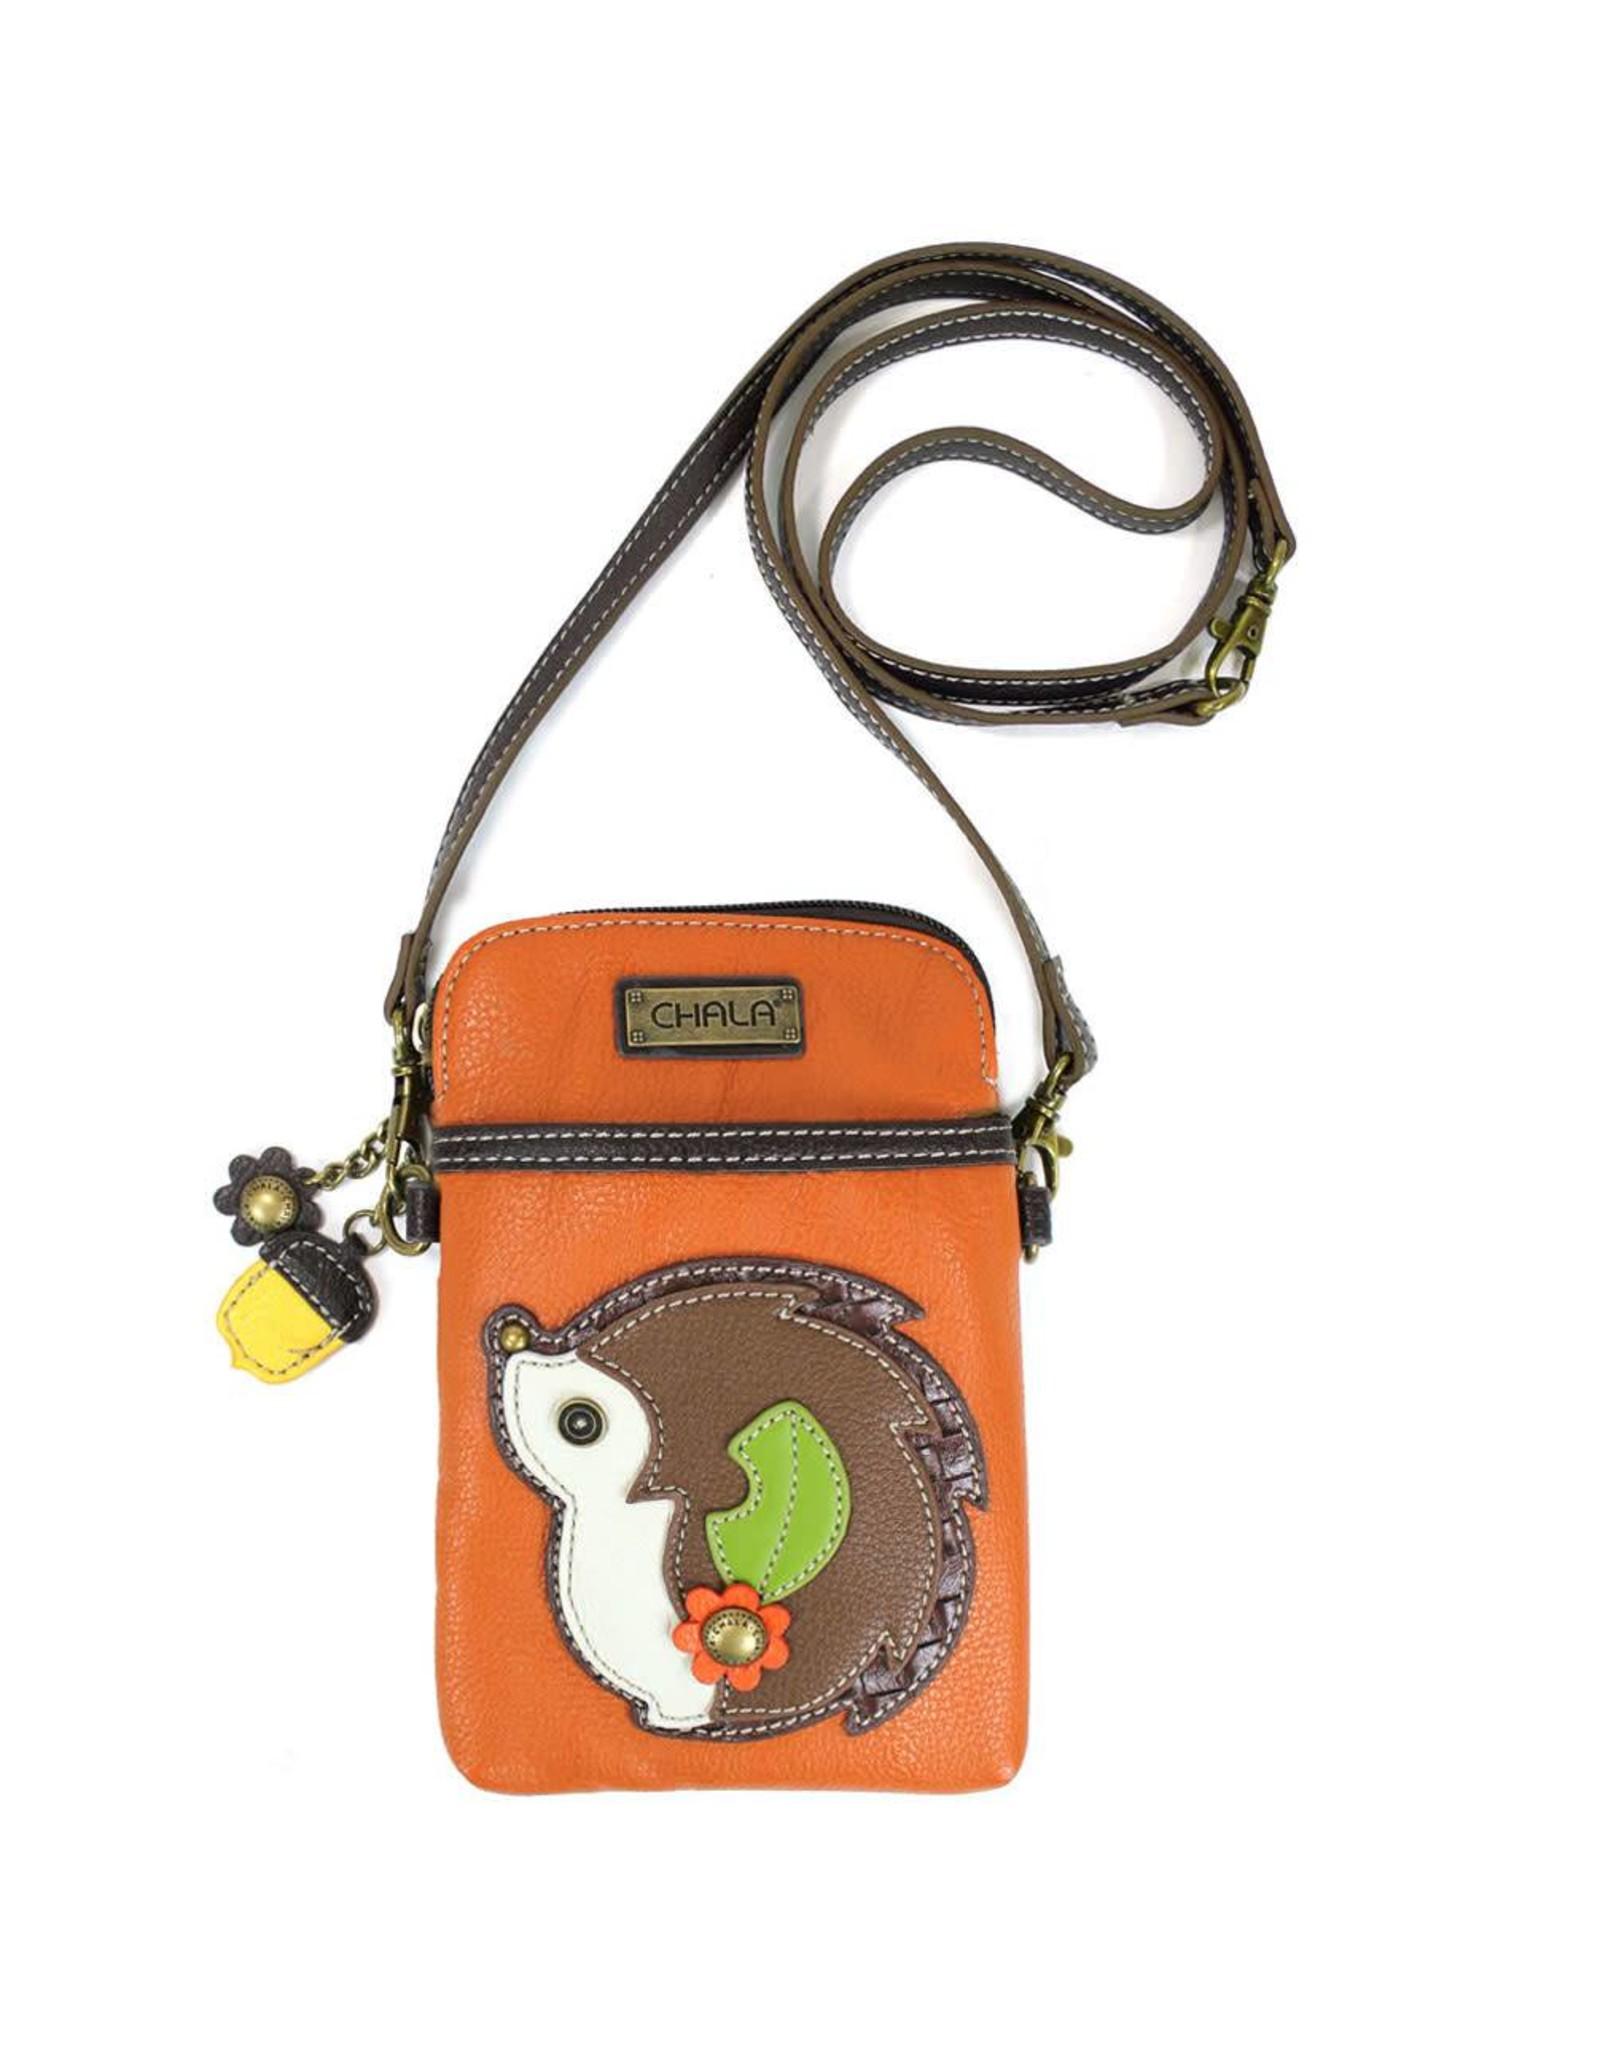 Chala Cell Phone Crossbody Hedgehog